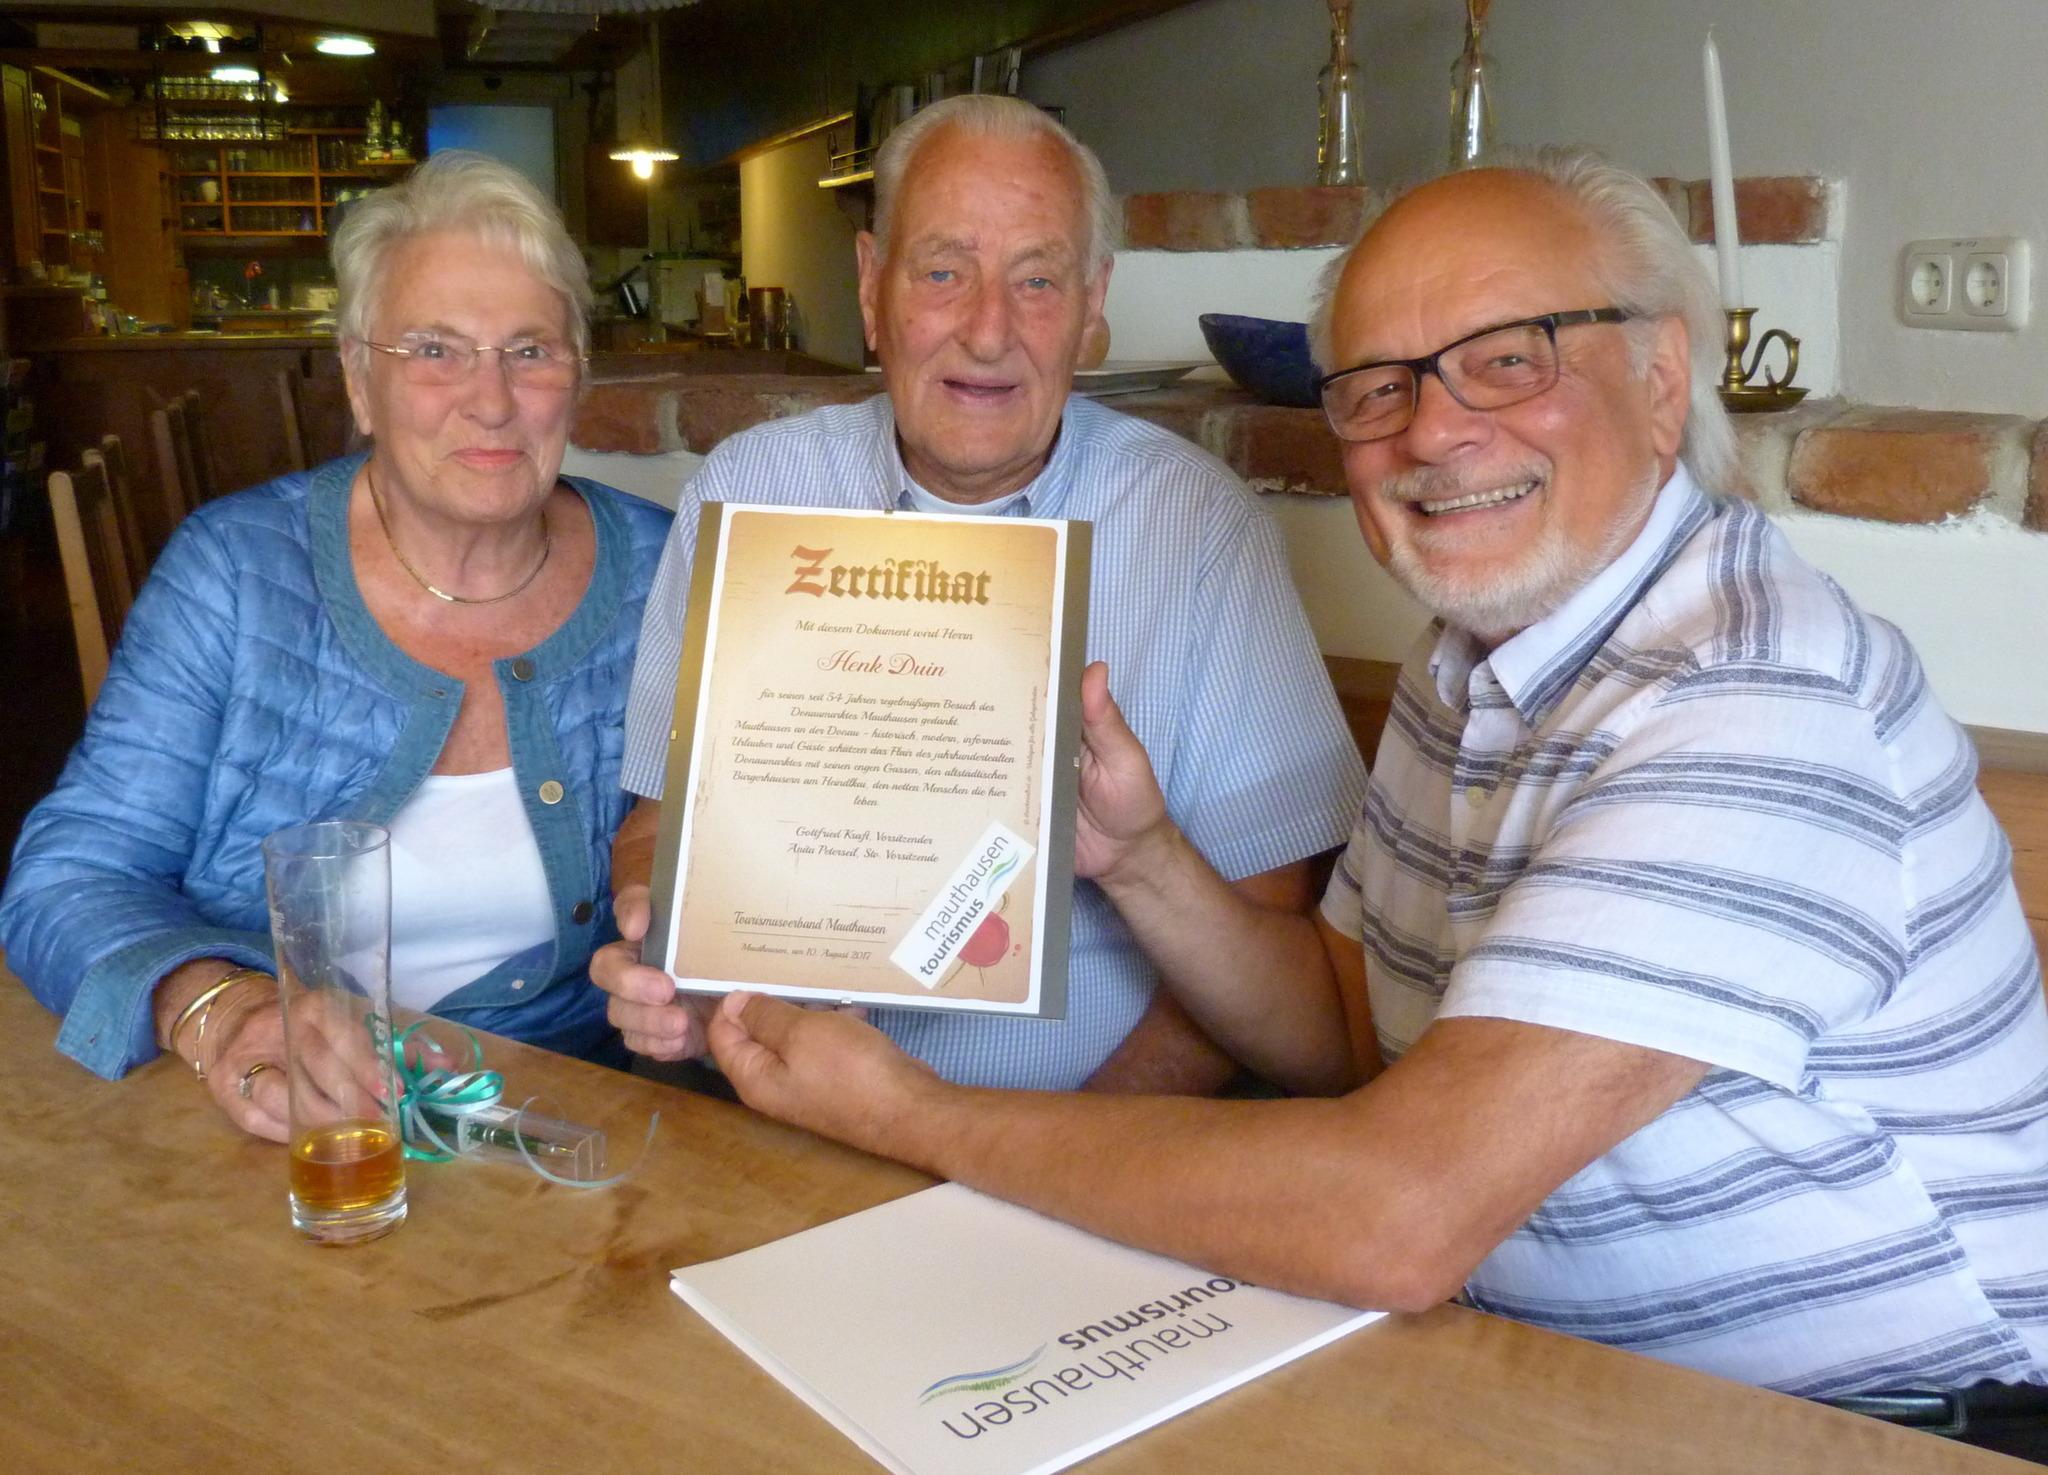 Tourismusverband Mauthausen in Perg - Thema auf